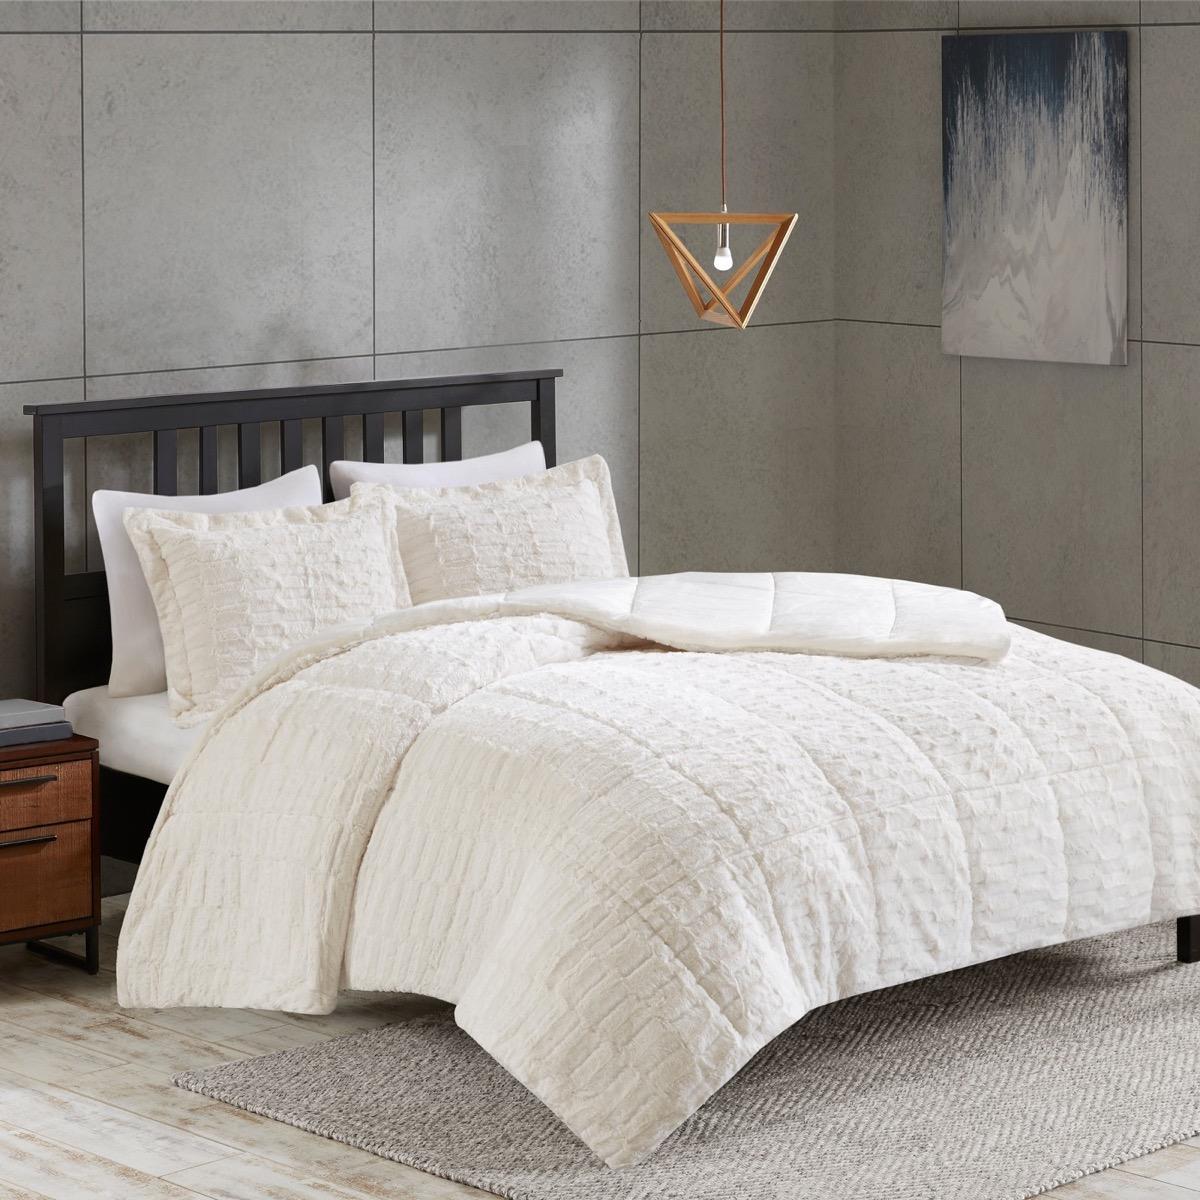 Faux Fur Bedding Set {Target Winter Essentials}